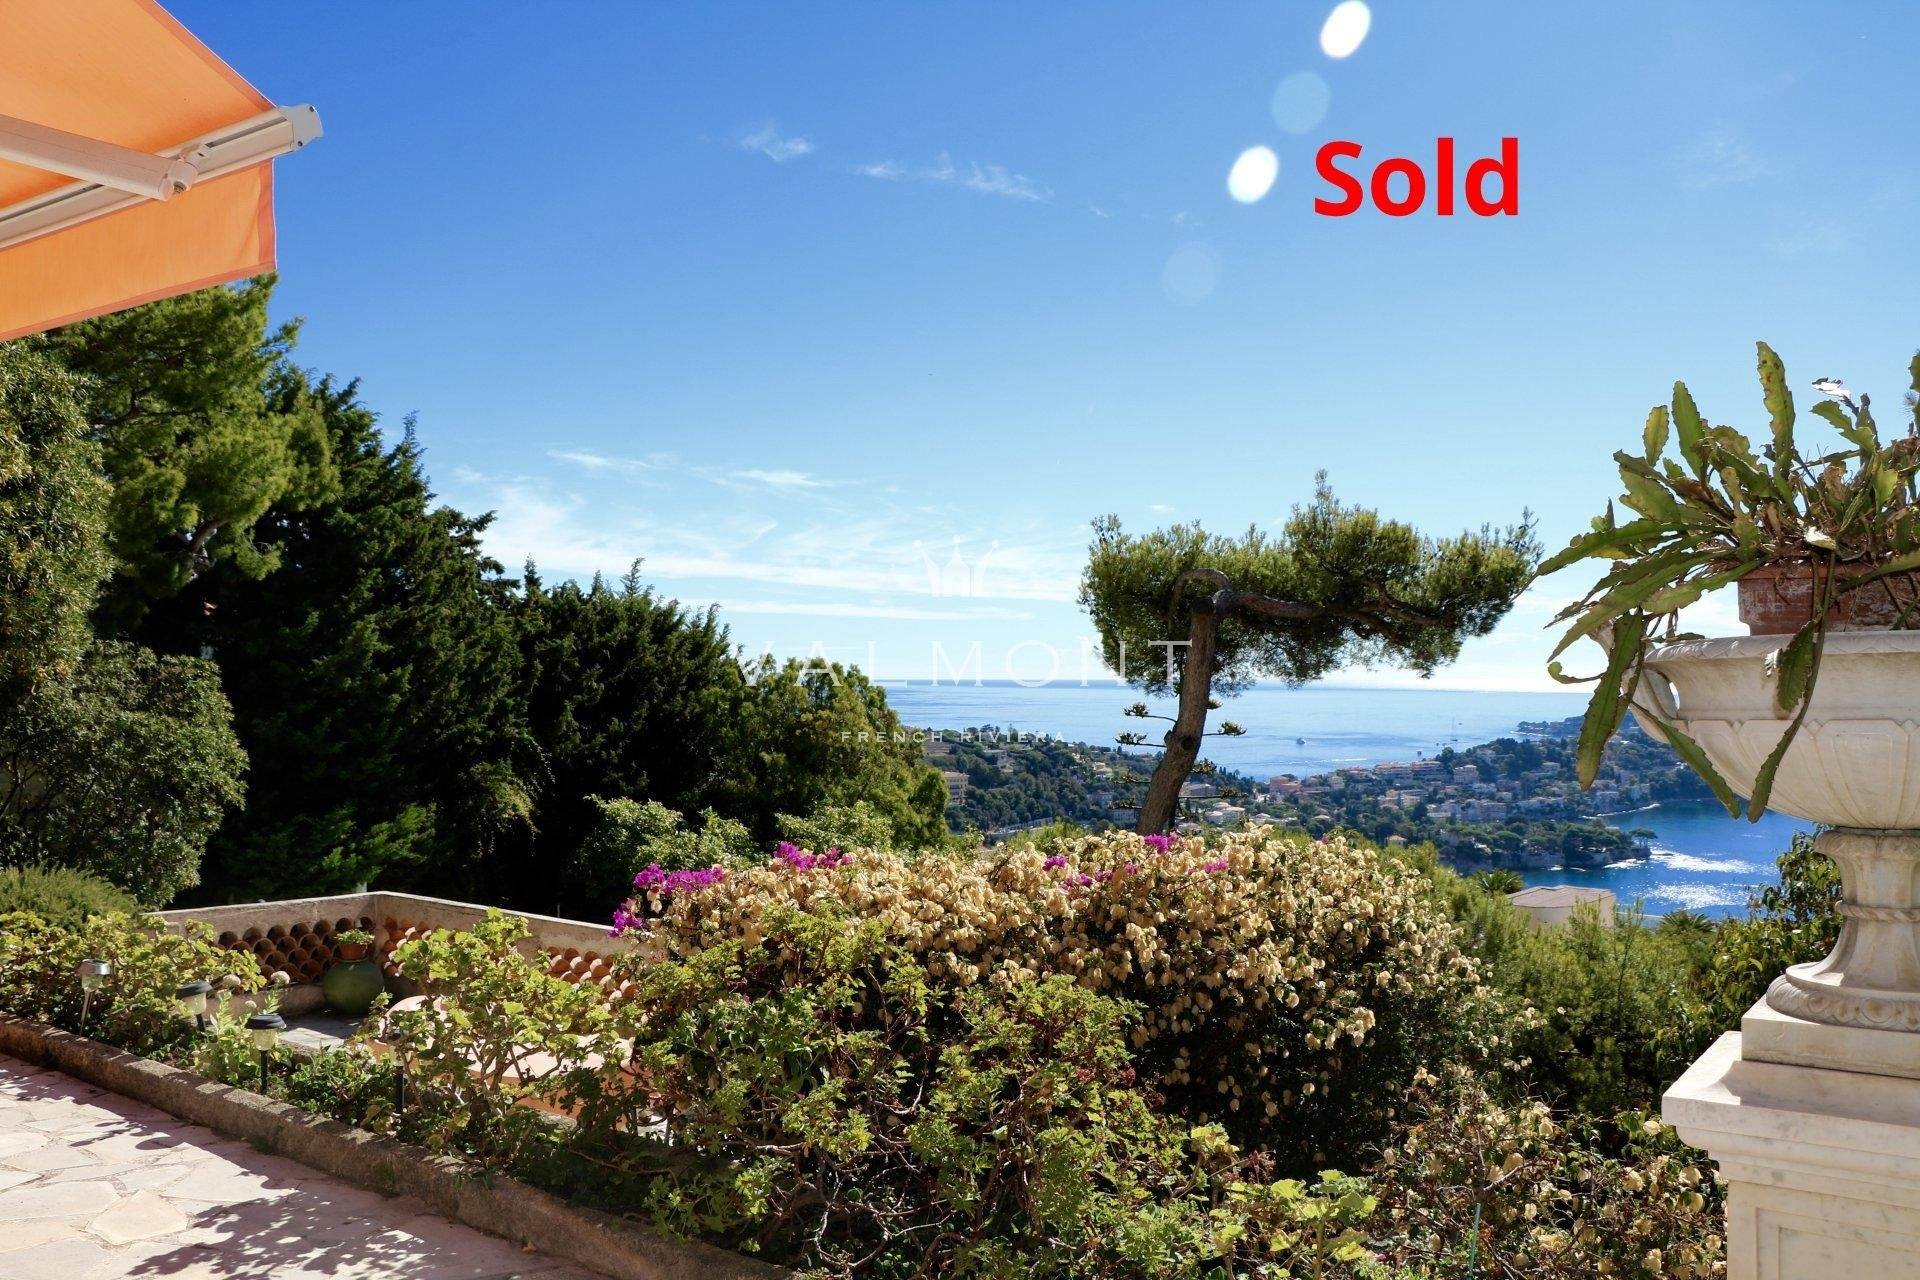 Продажа Апартаменты-вилла - Вильфранш-сюр-Мер (Villefranche-sur-Mer) Corne d'Or